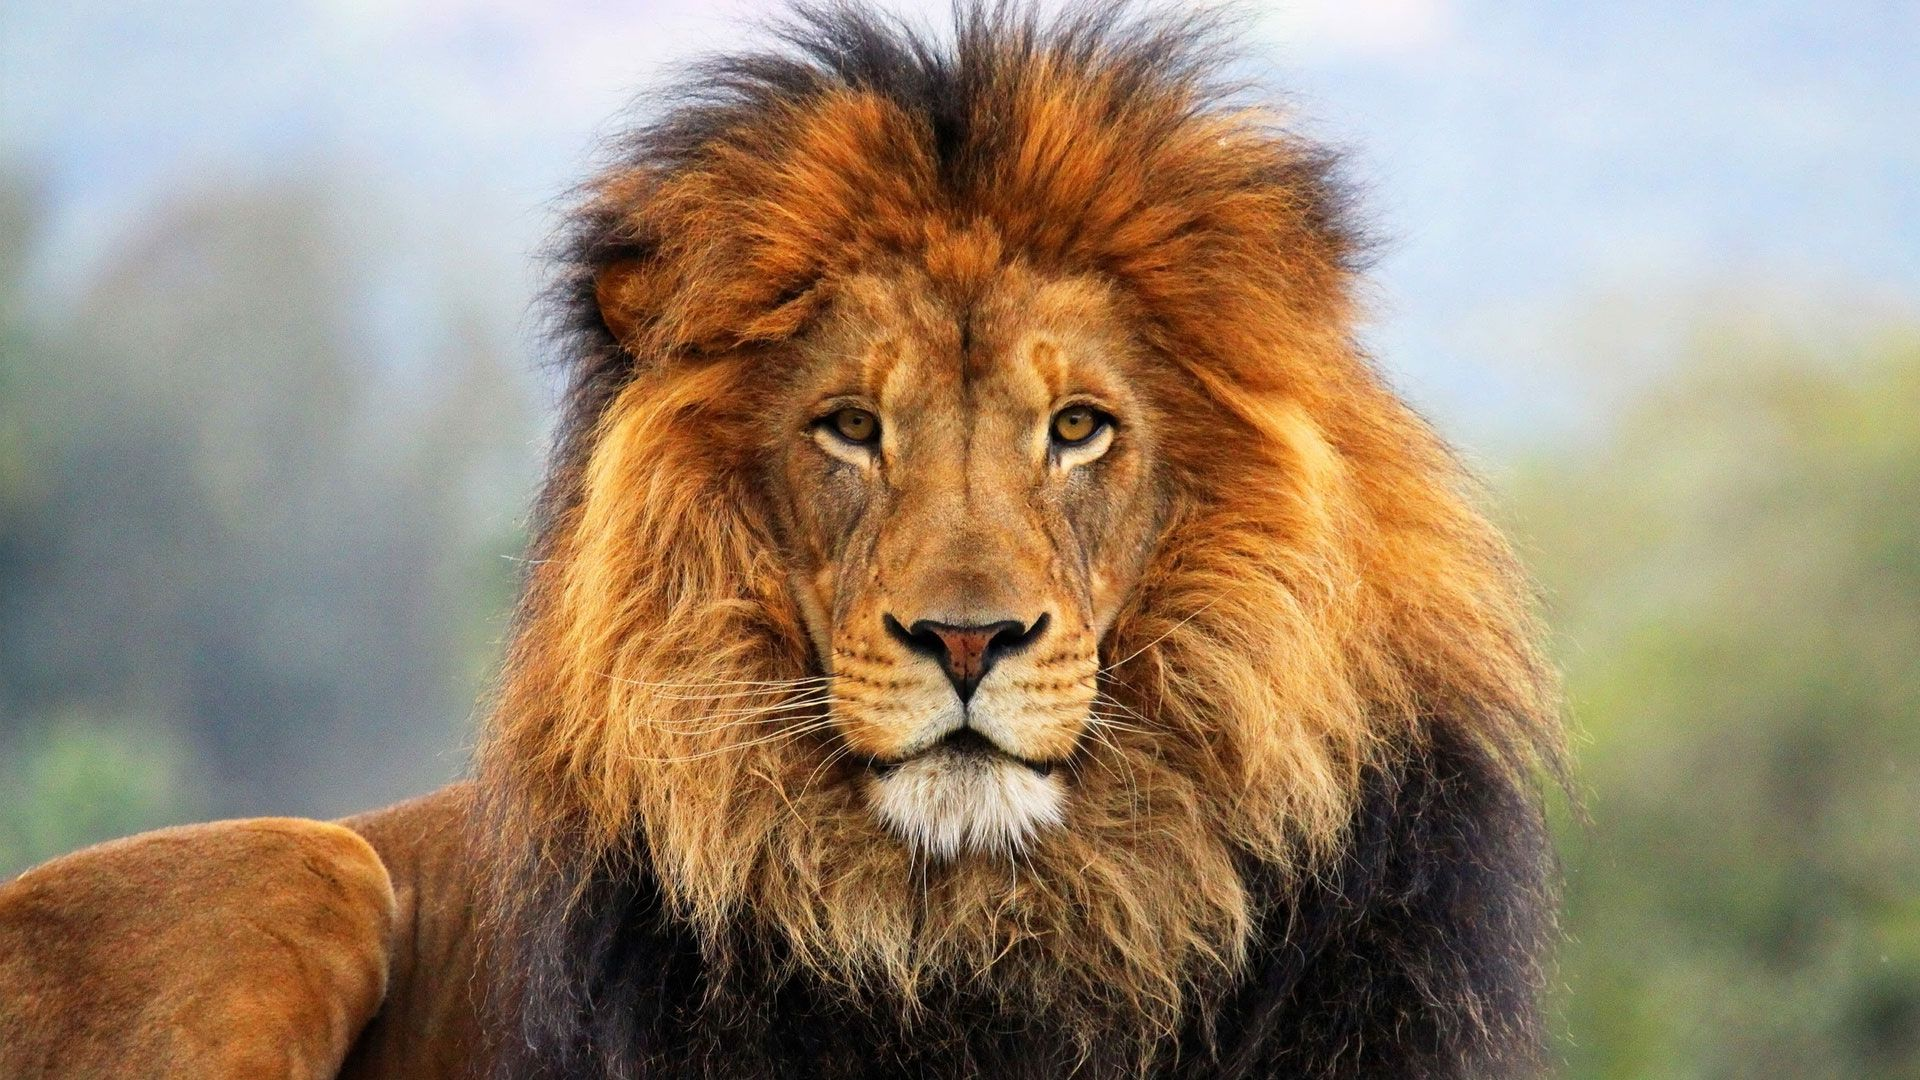 Lion Wallpaper Hd 1080p - Free Large Images